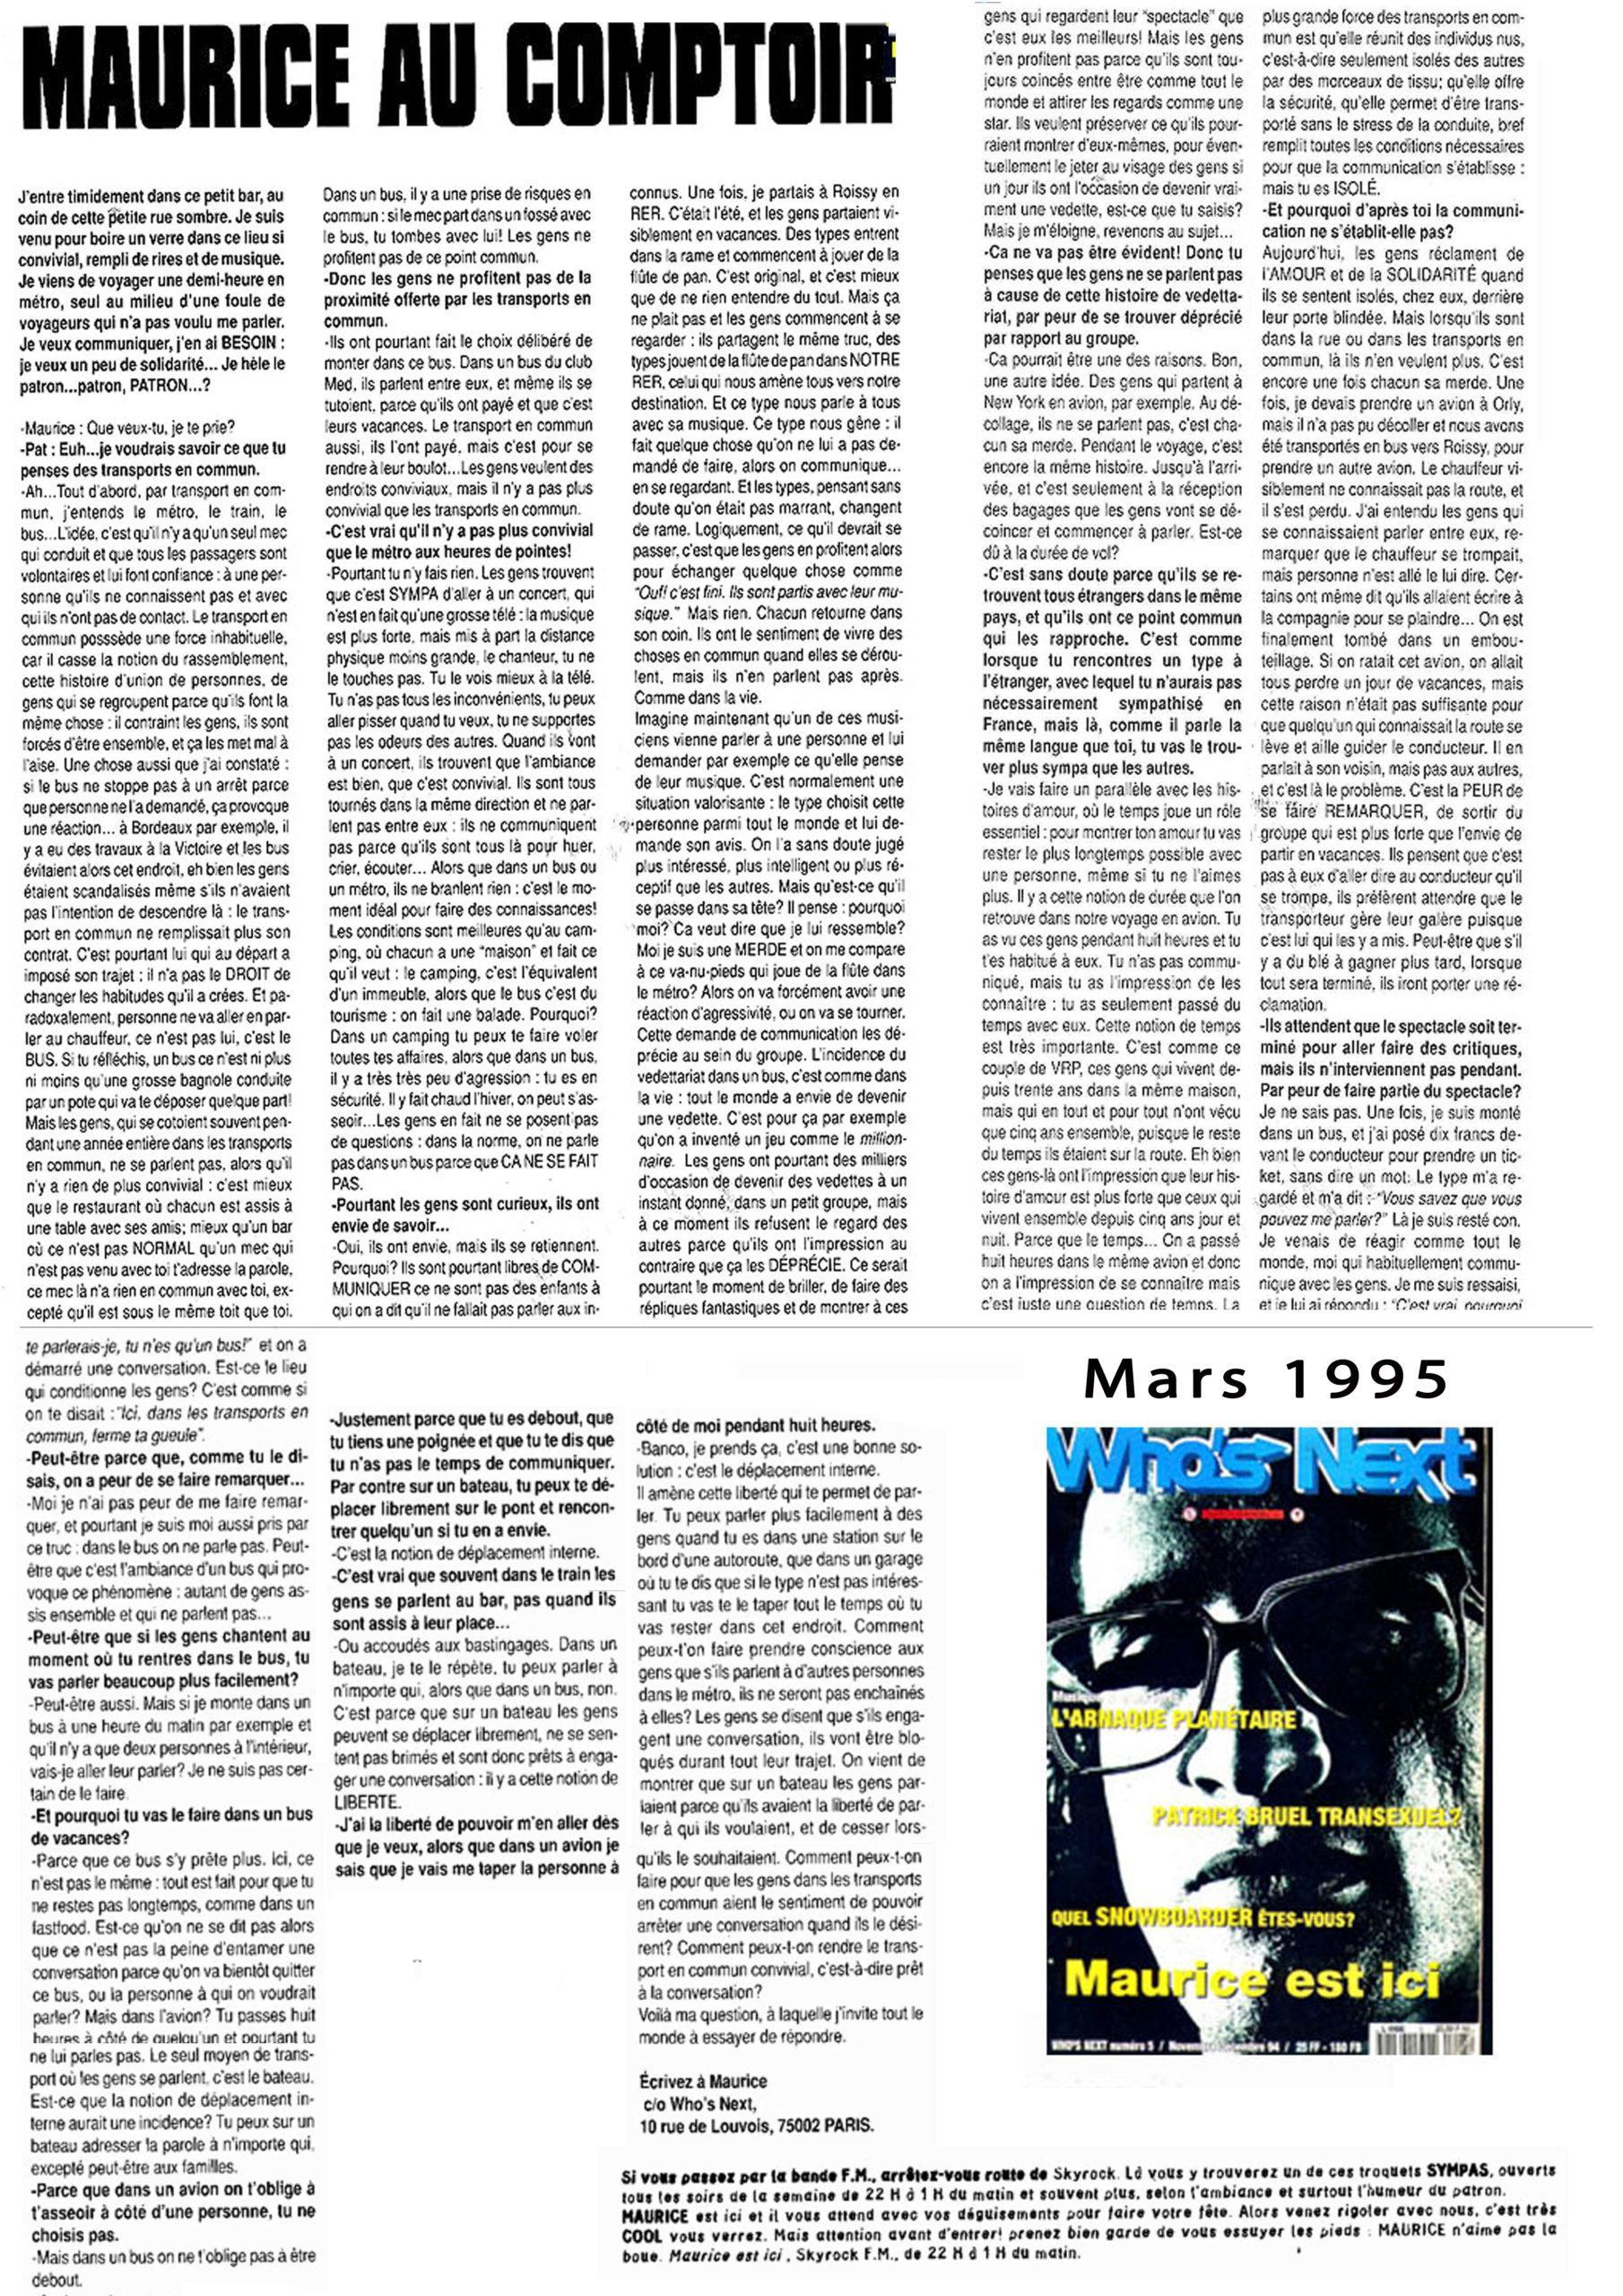 vignette Who's Next Maurice au Comptoir - Mars 1995